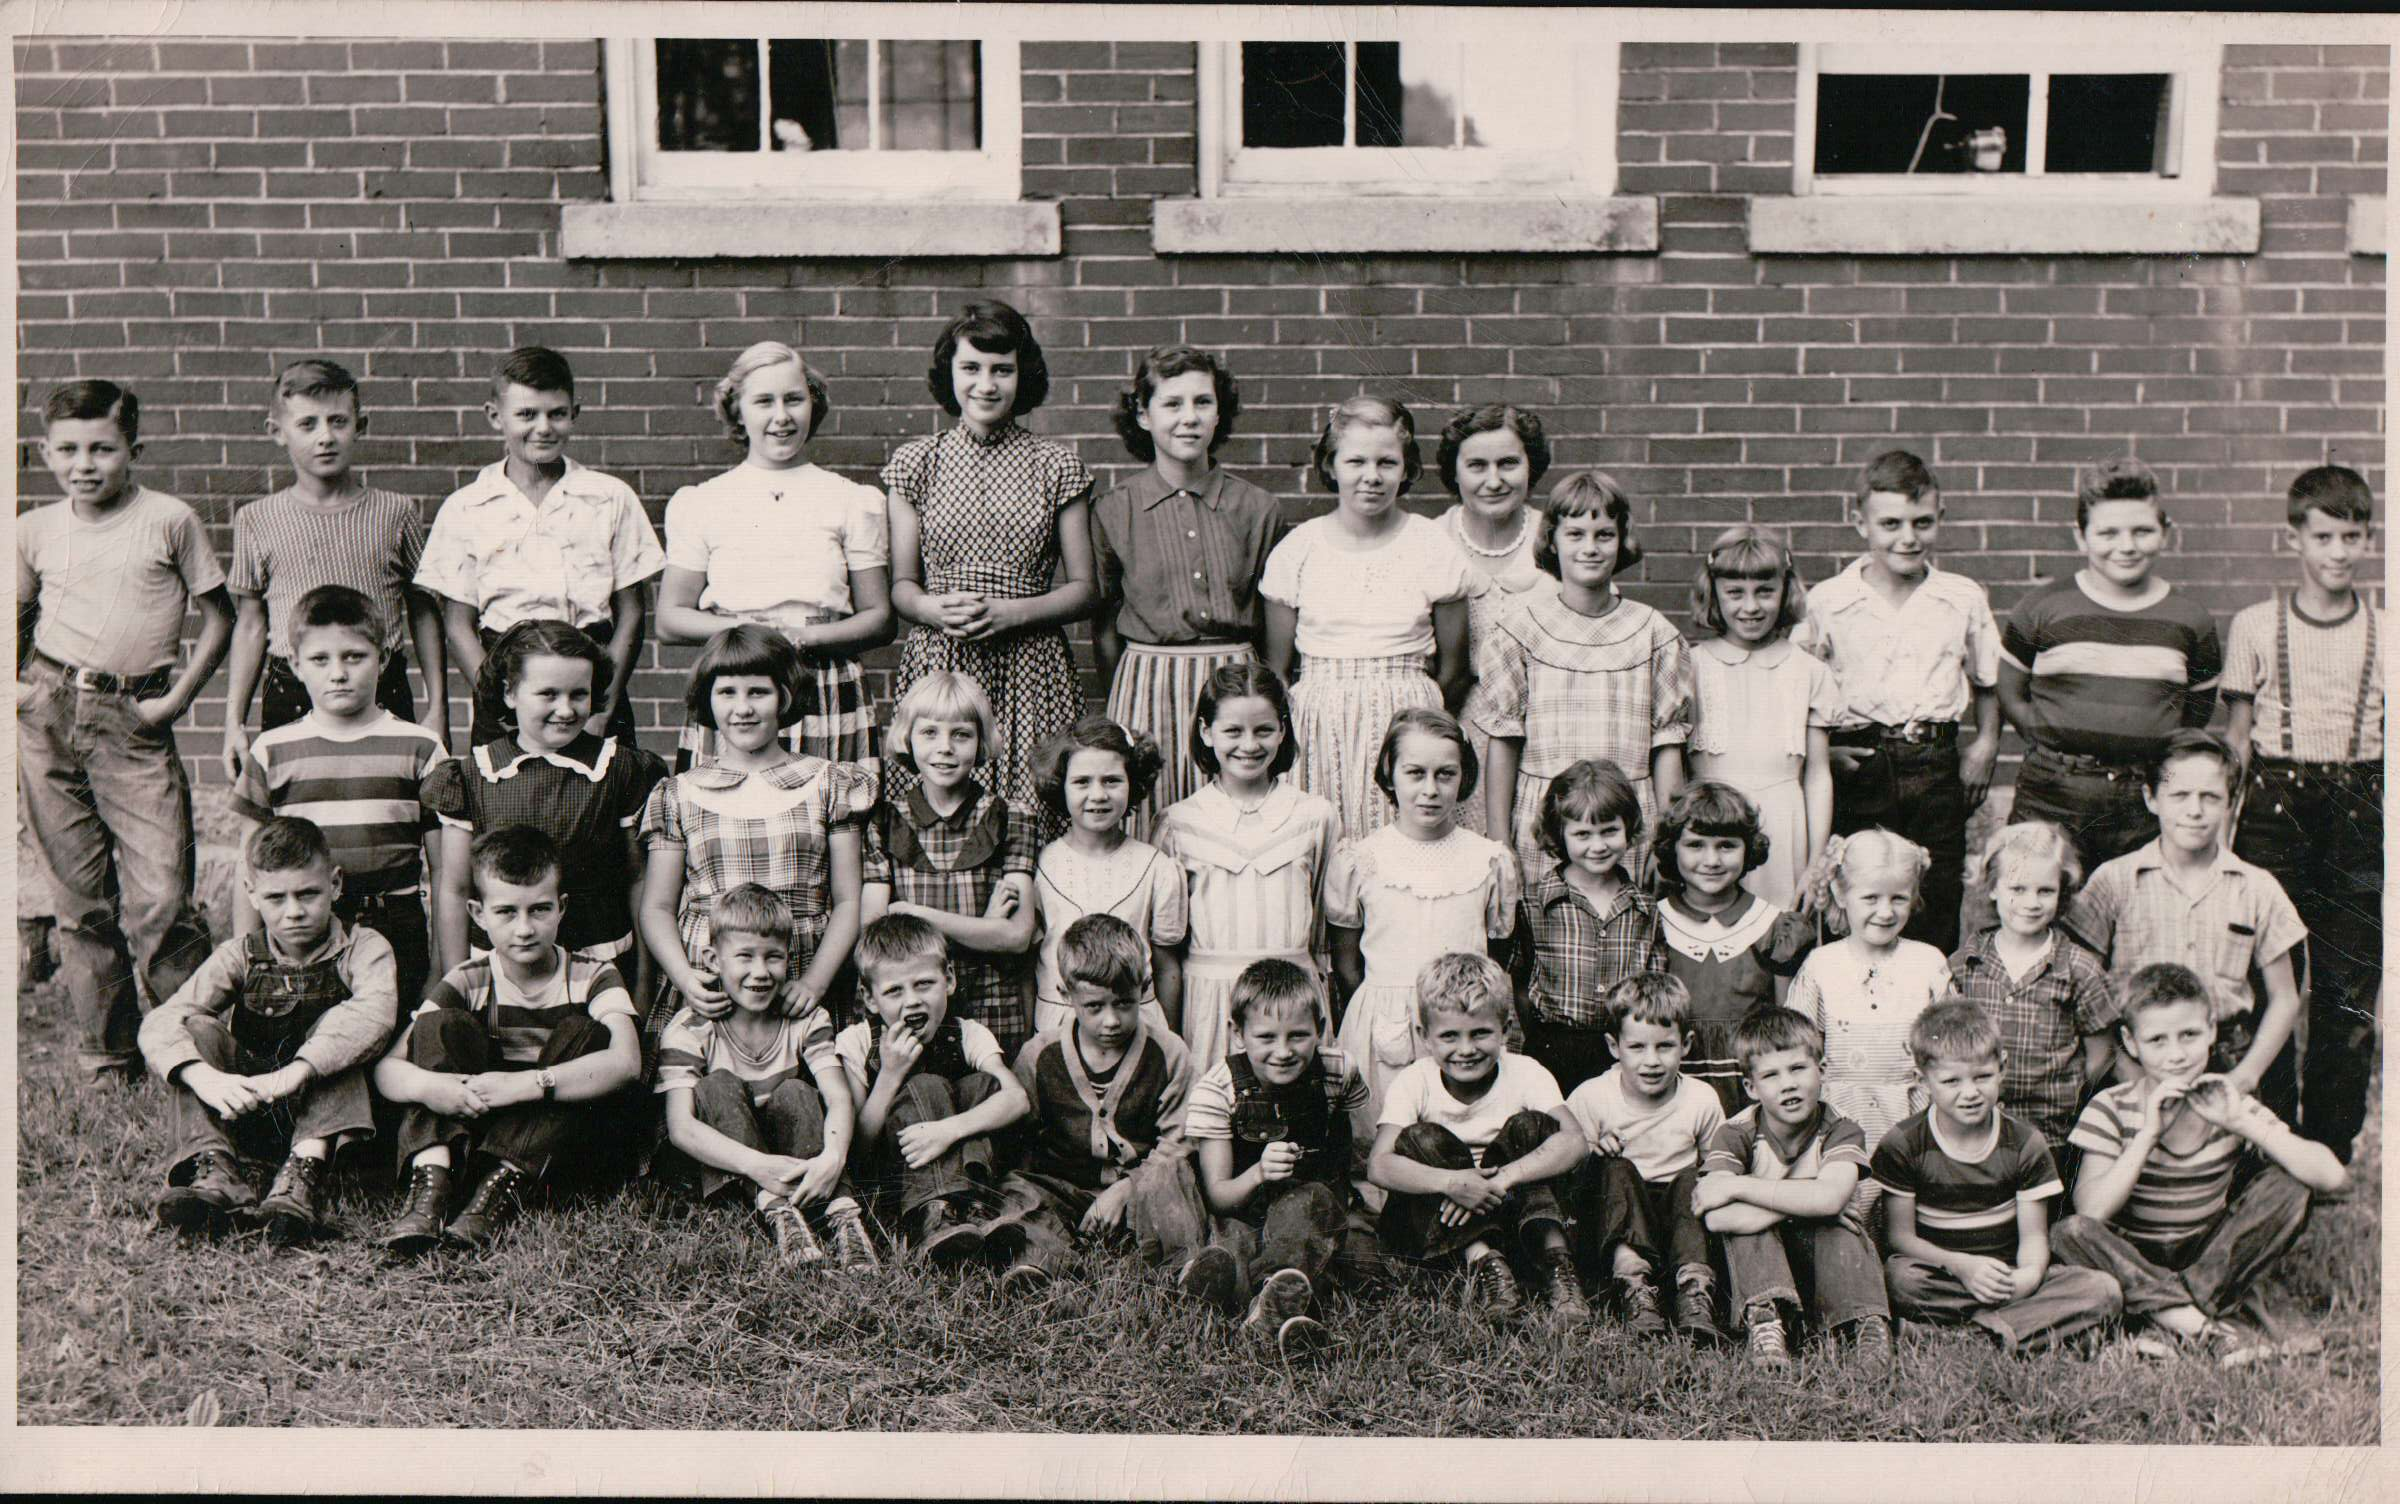 Hesston school